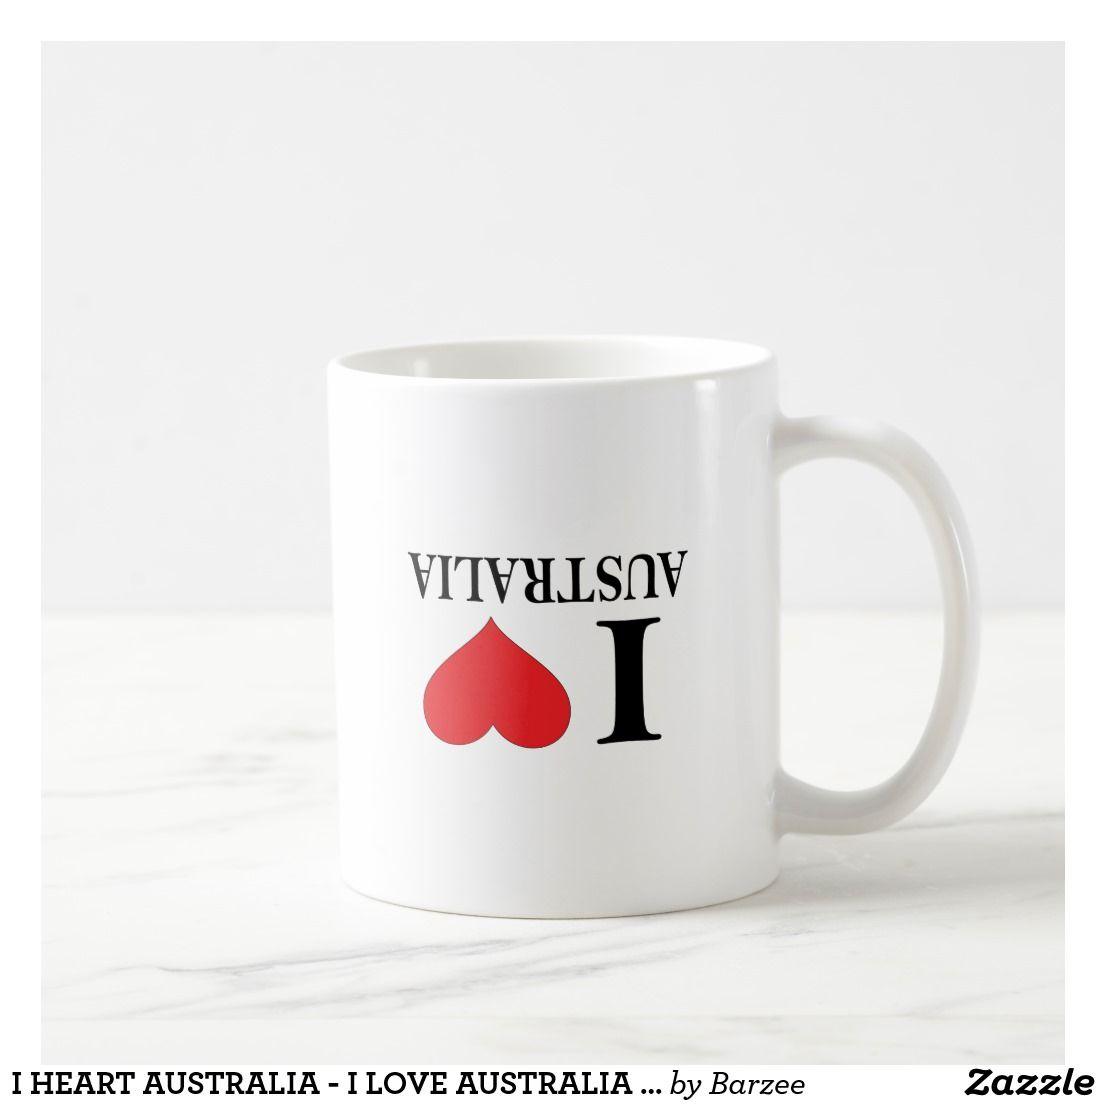 I HEART AUSTRALIA - I LOVE AUSTRALIA - UPSIDE DOWN COFFEE ...